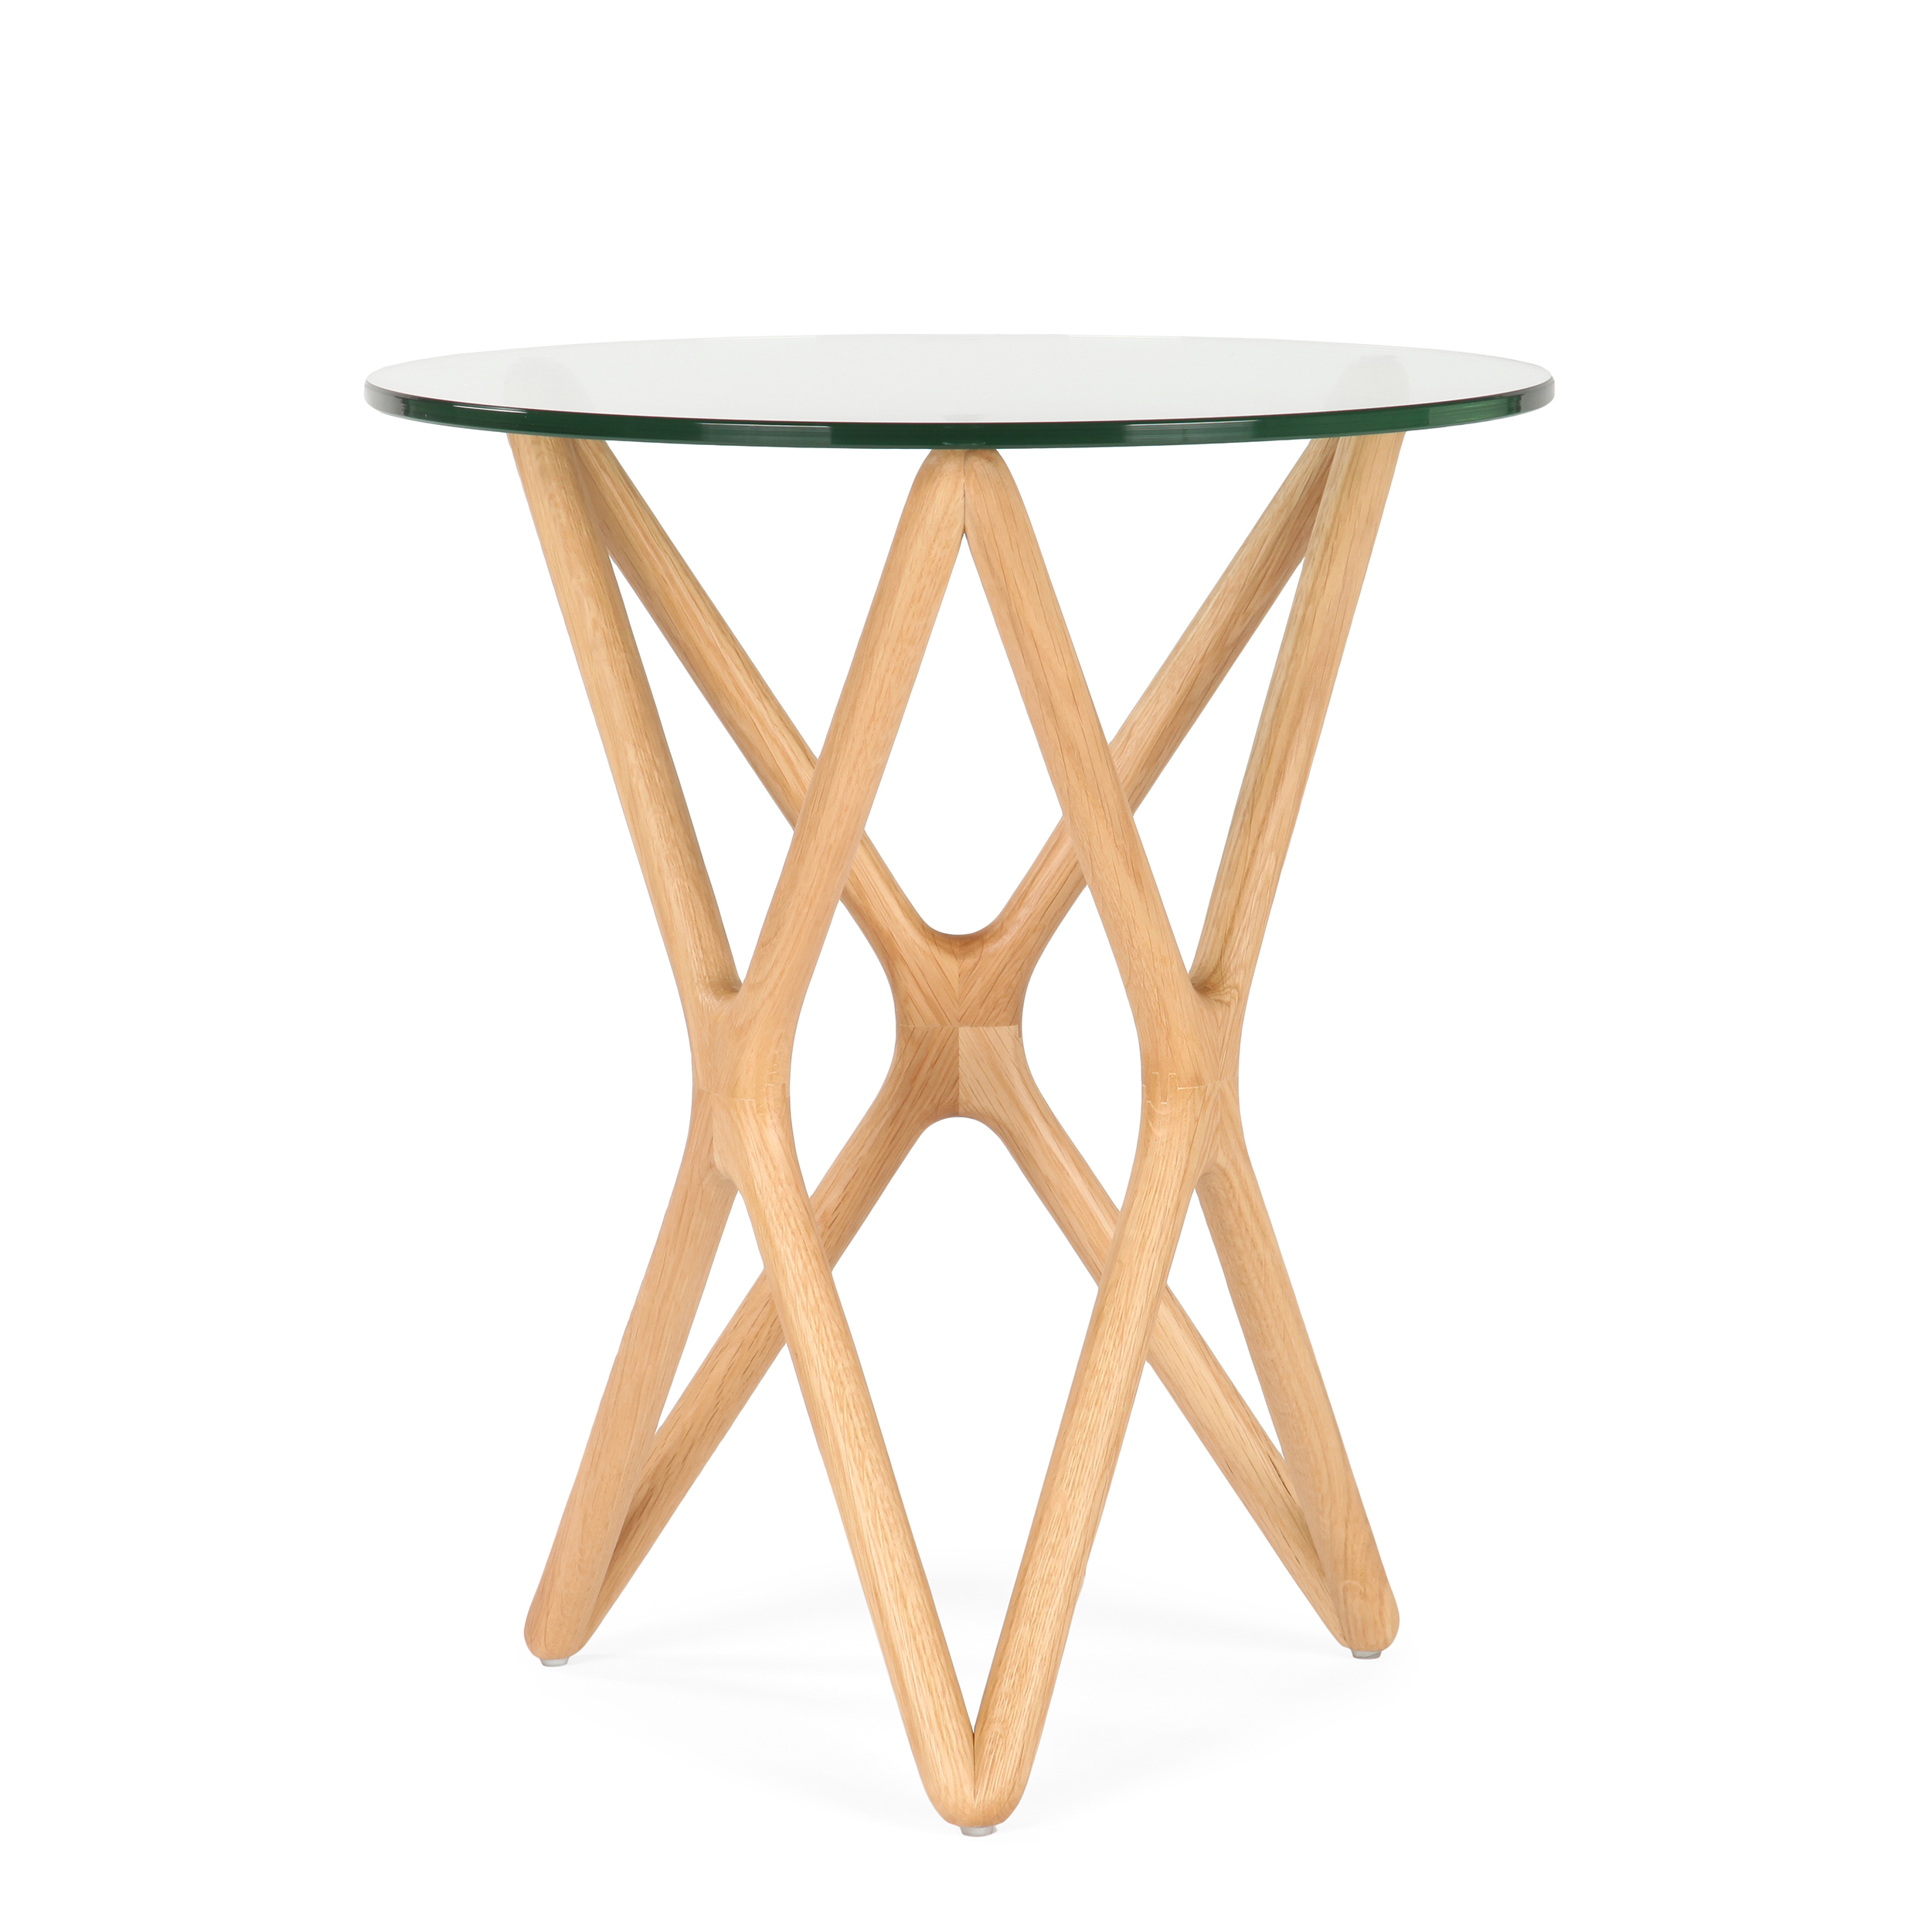 Кофейный стол Triple X высота 56 кофейный стол machine высота 40